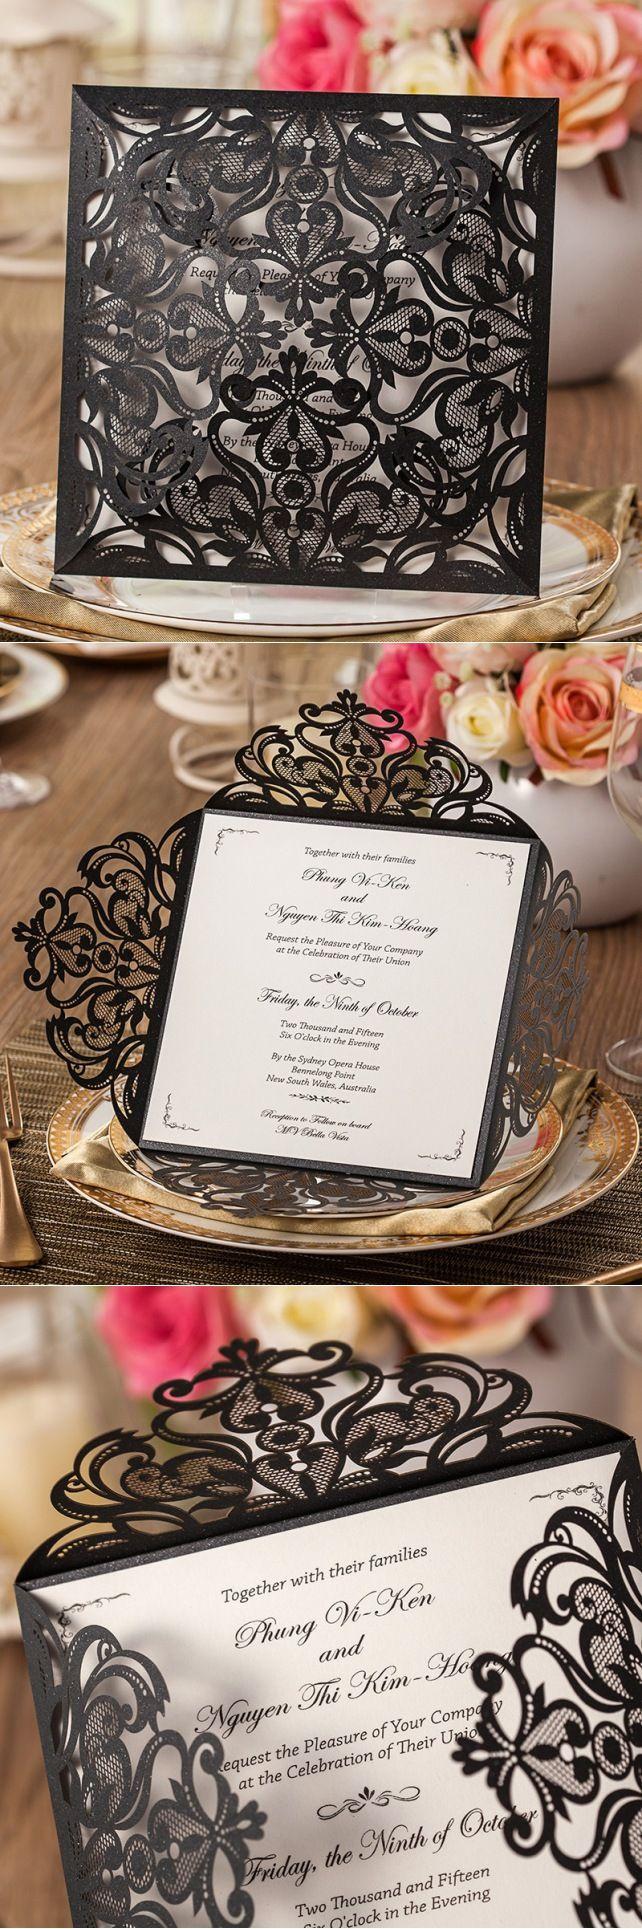 10 Best Wedding Invitation Images On Pinterest Winter Barn